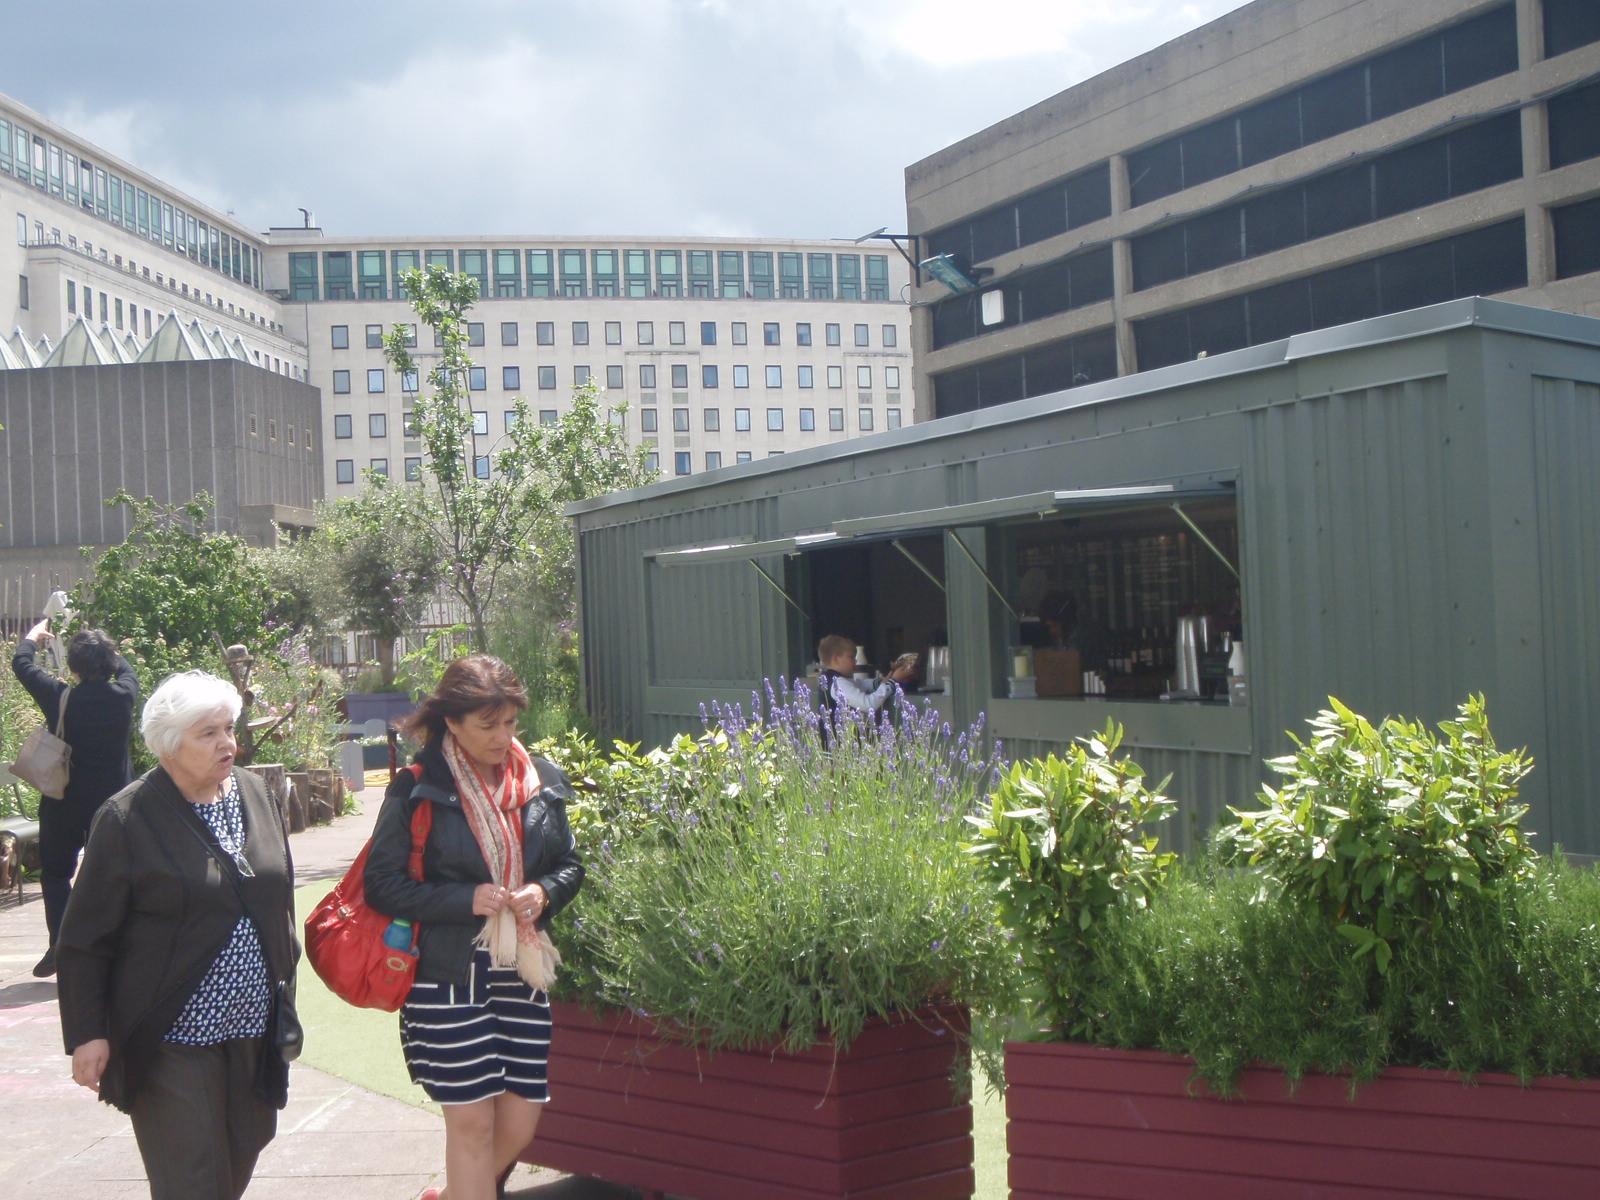 London: QE Hall Roof Garden | City Love